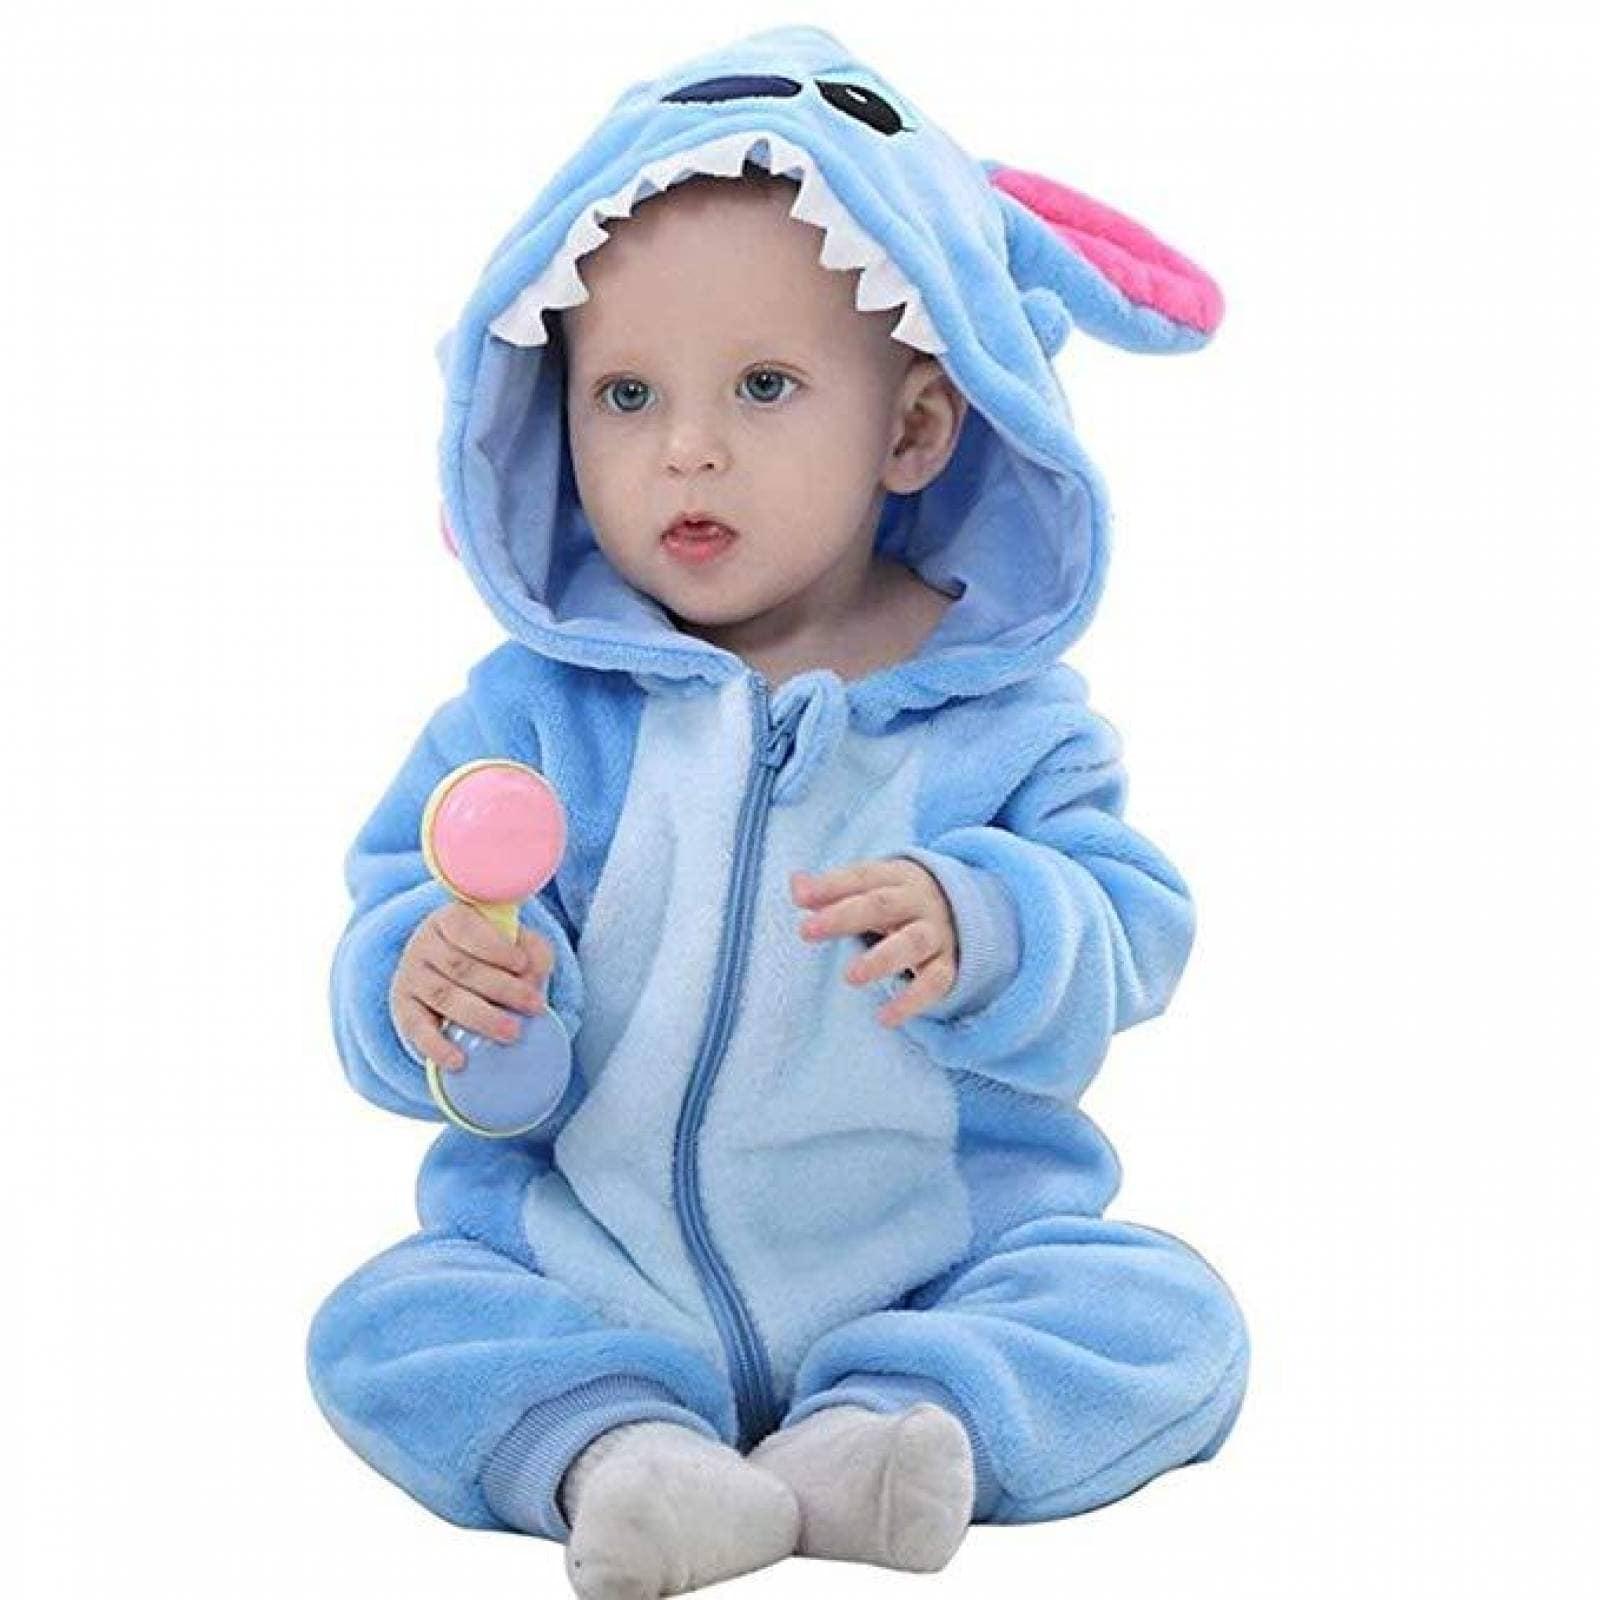 Mameluco para Bebe con Capucha 6-24 Stitch meses disfraz